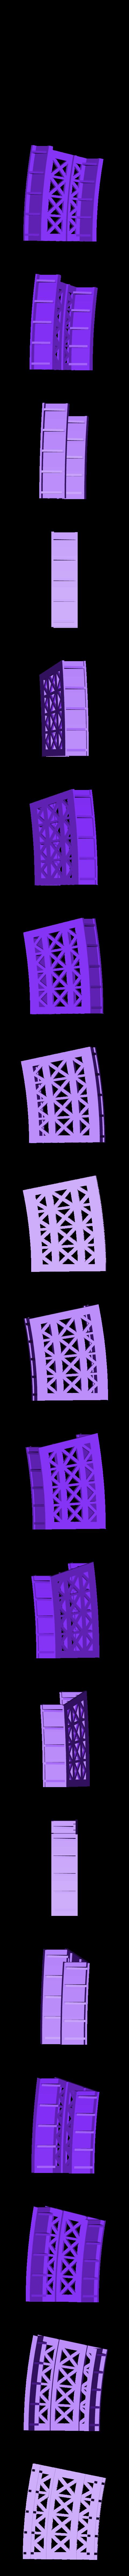 "18_Inch_Radius_Bridge.stl Download free STL file HO Scale 18"" Radius Curved Bridge • 3D print model, kabrumble"